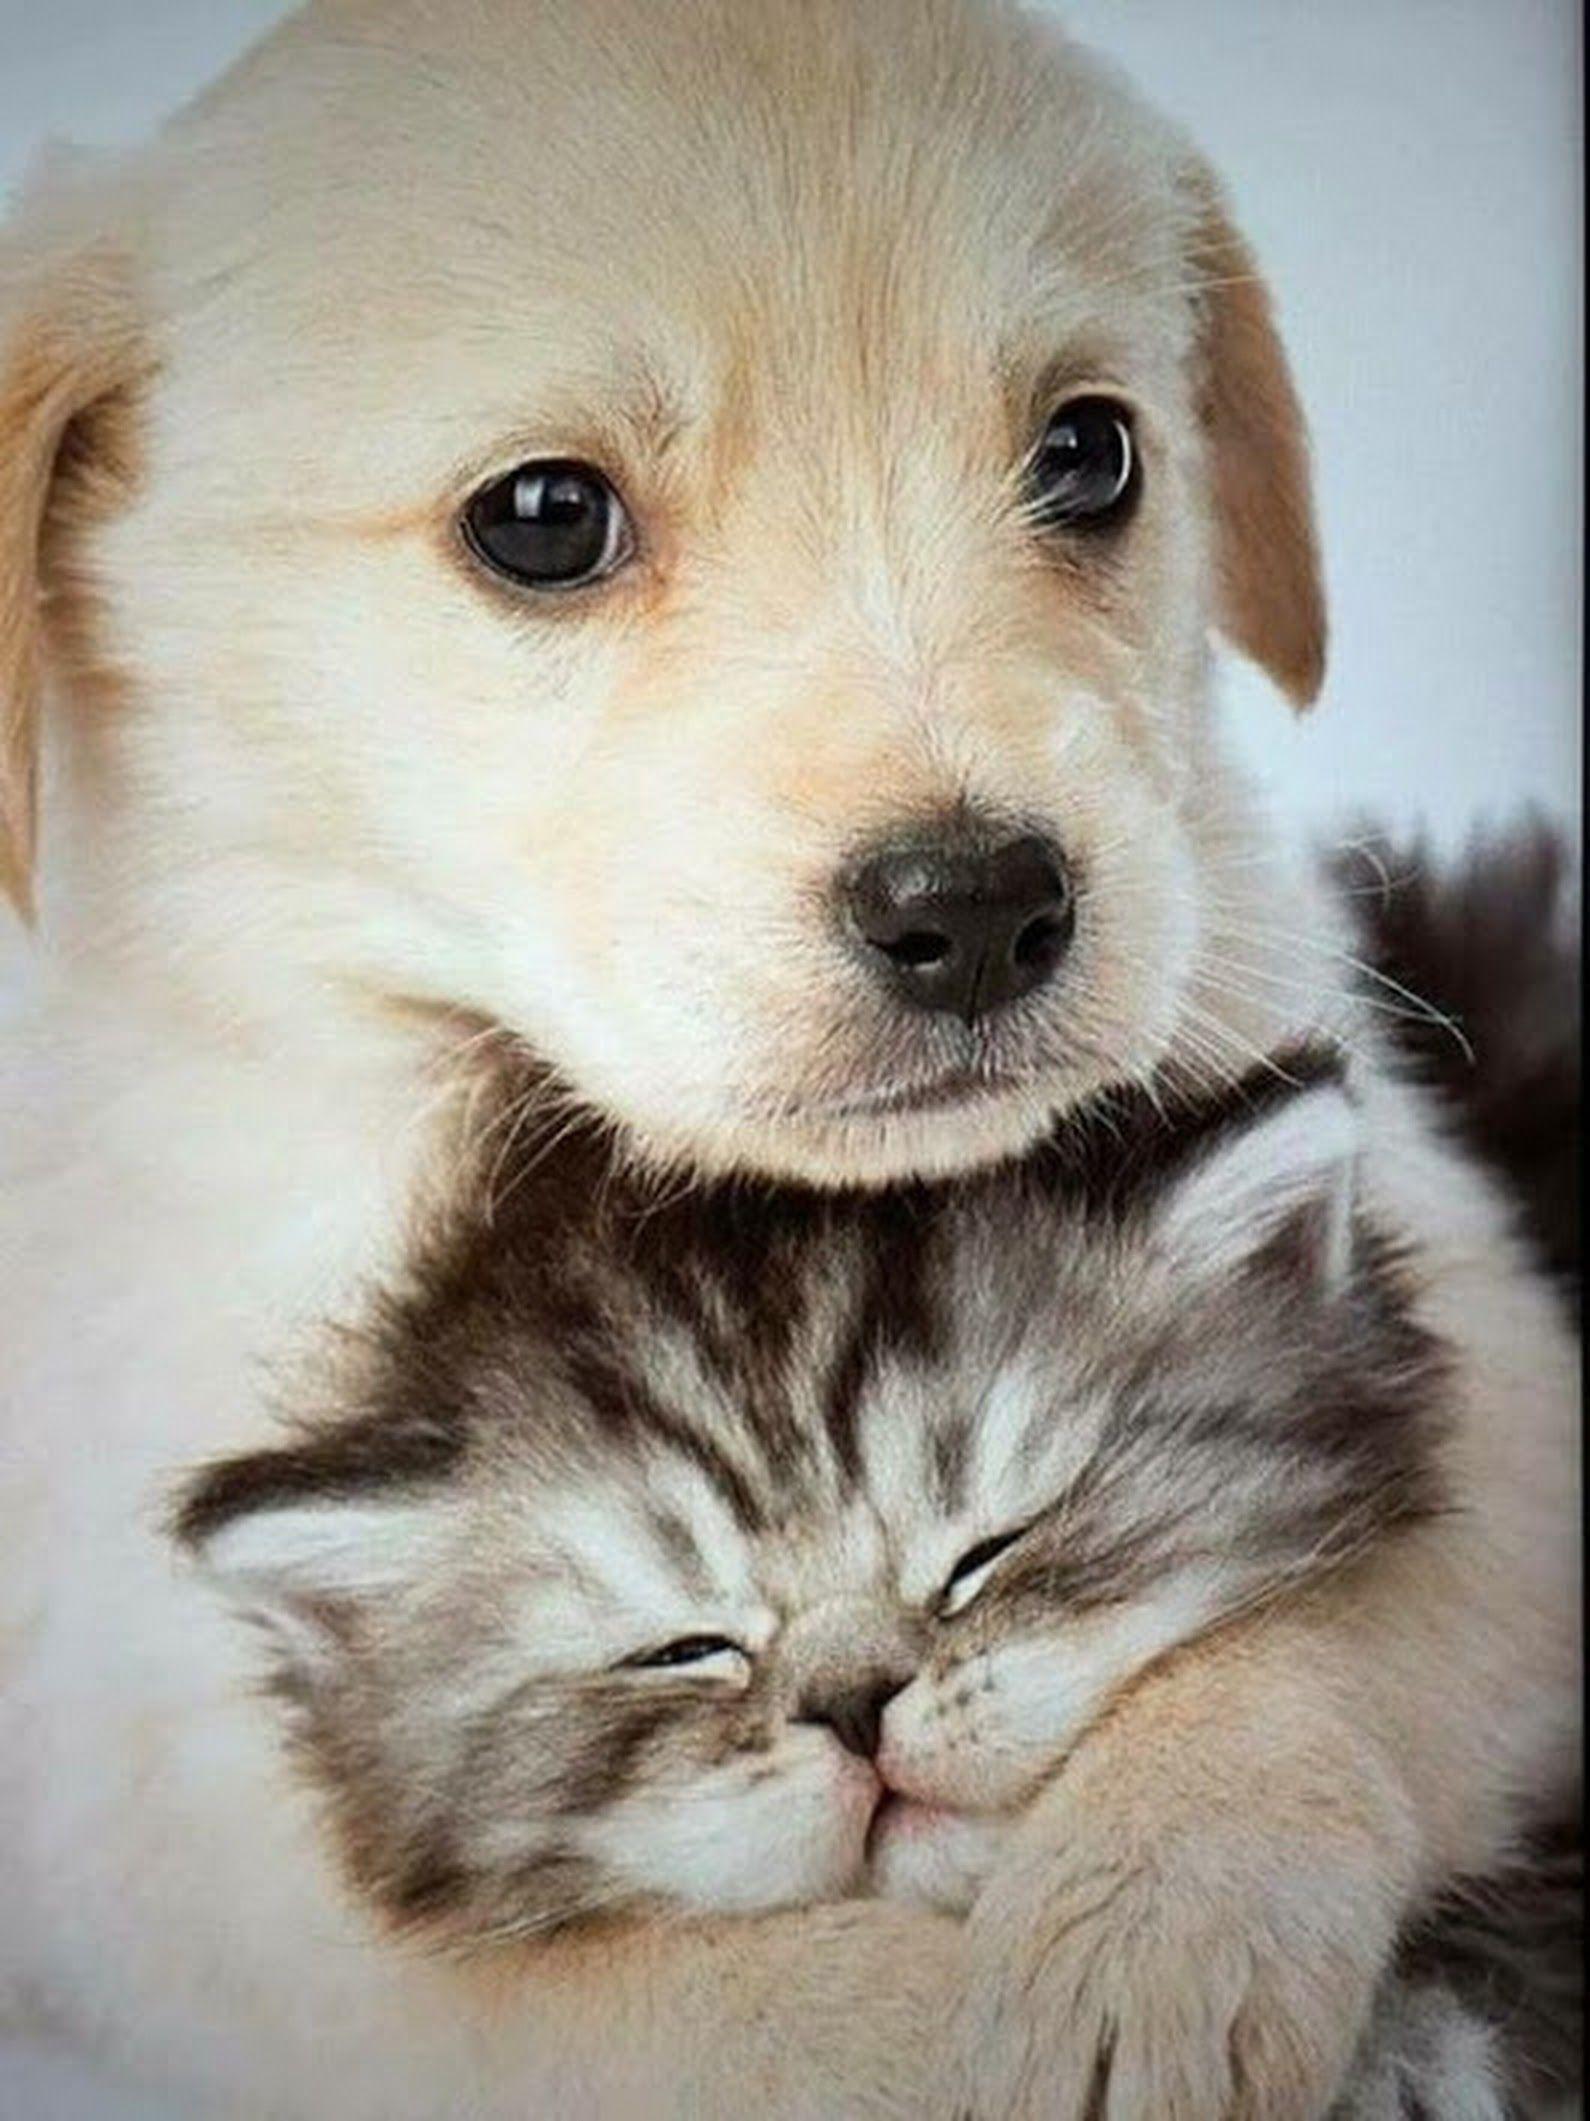 imagens fofos de animais Google Search (With images